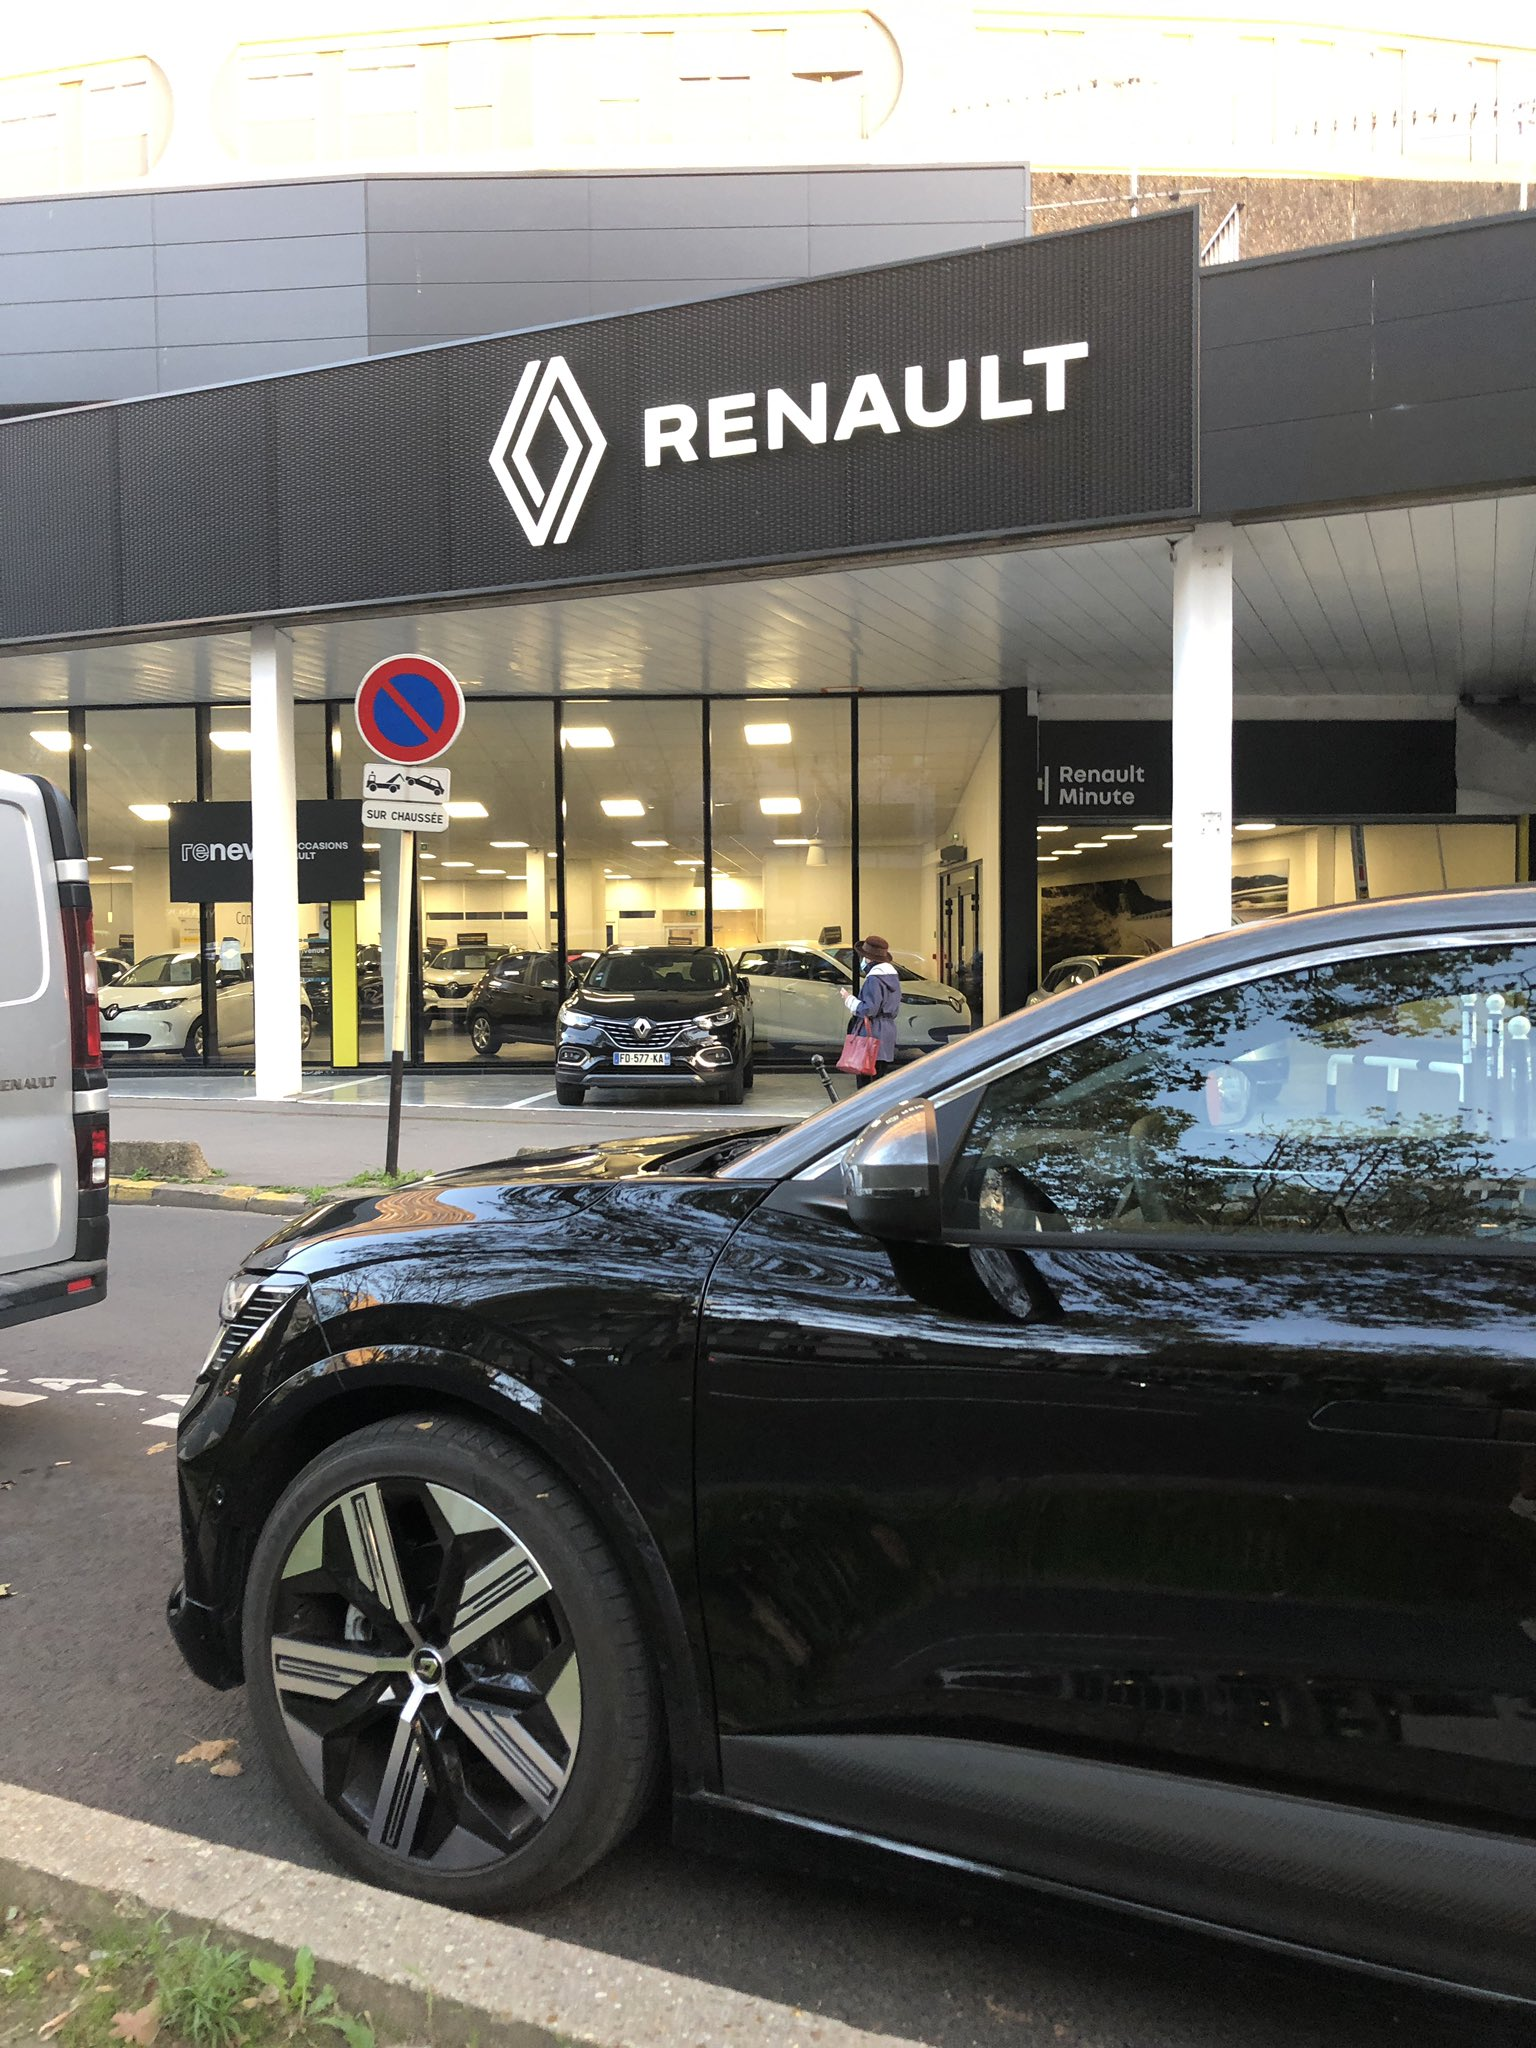 2021 - [Renault] Mégane E-Tech Electric [BCB] - Page 15 FBmNHvlWYAof82O?format=jpg&name=large